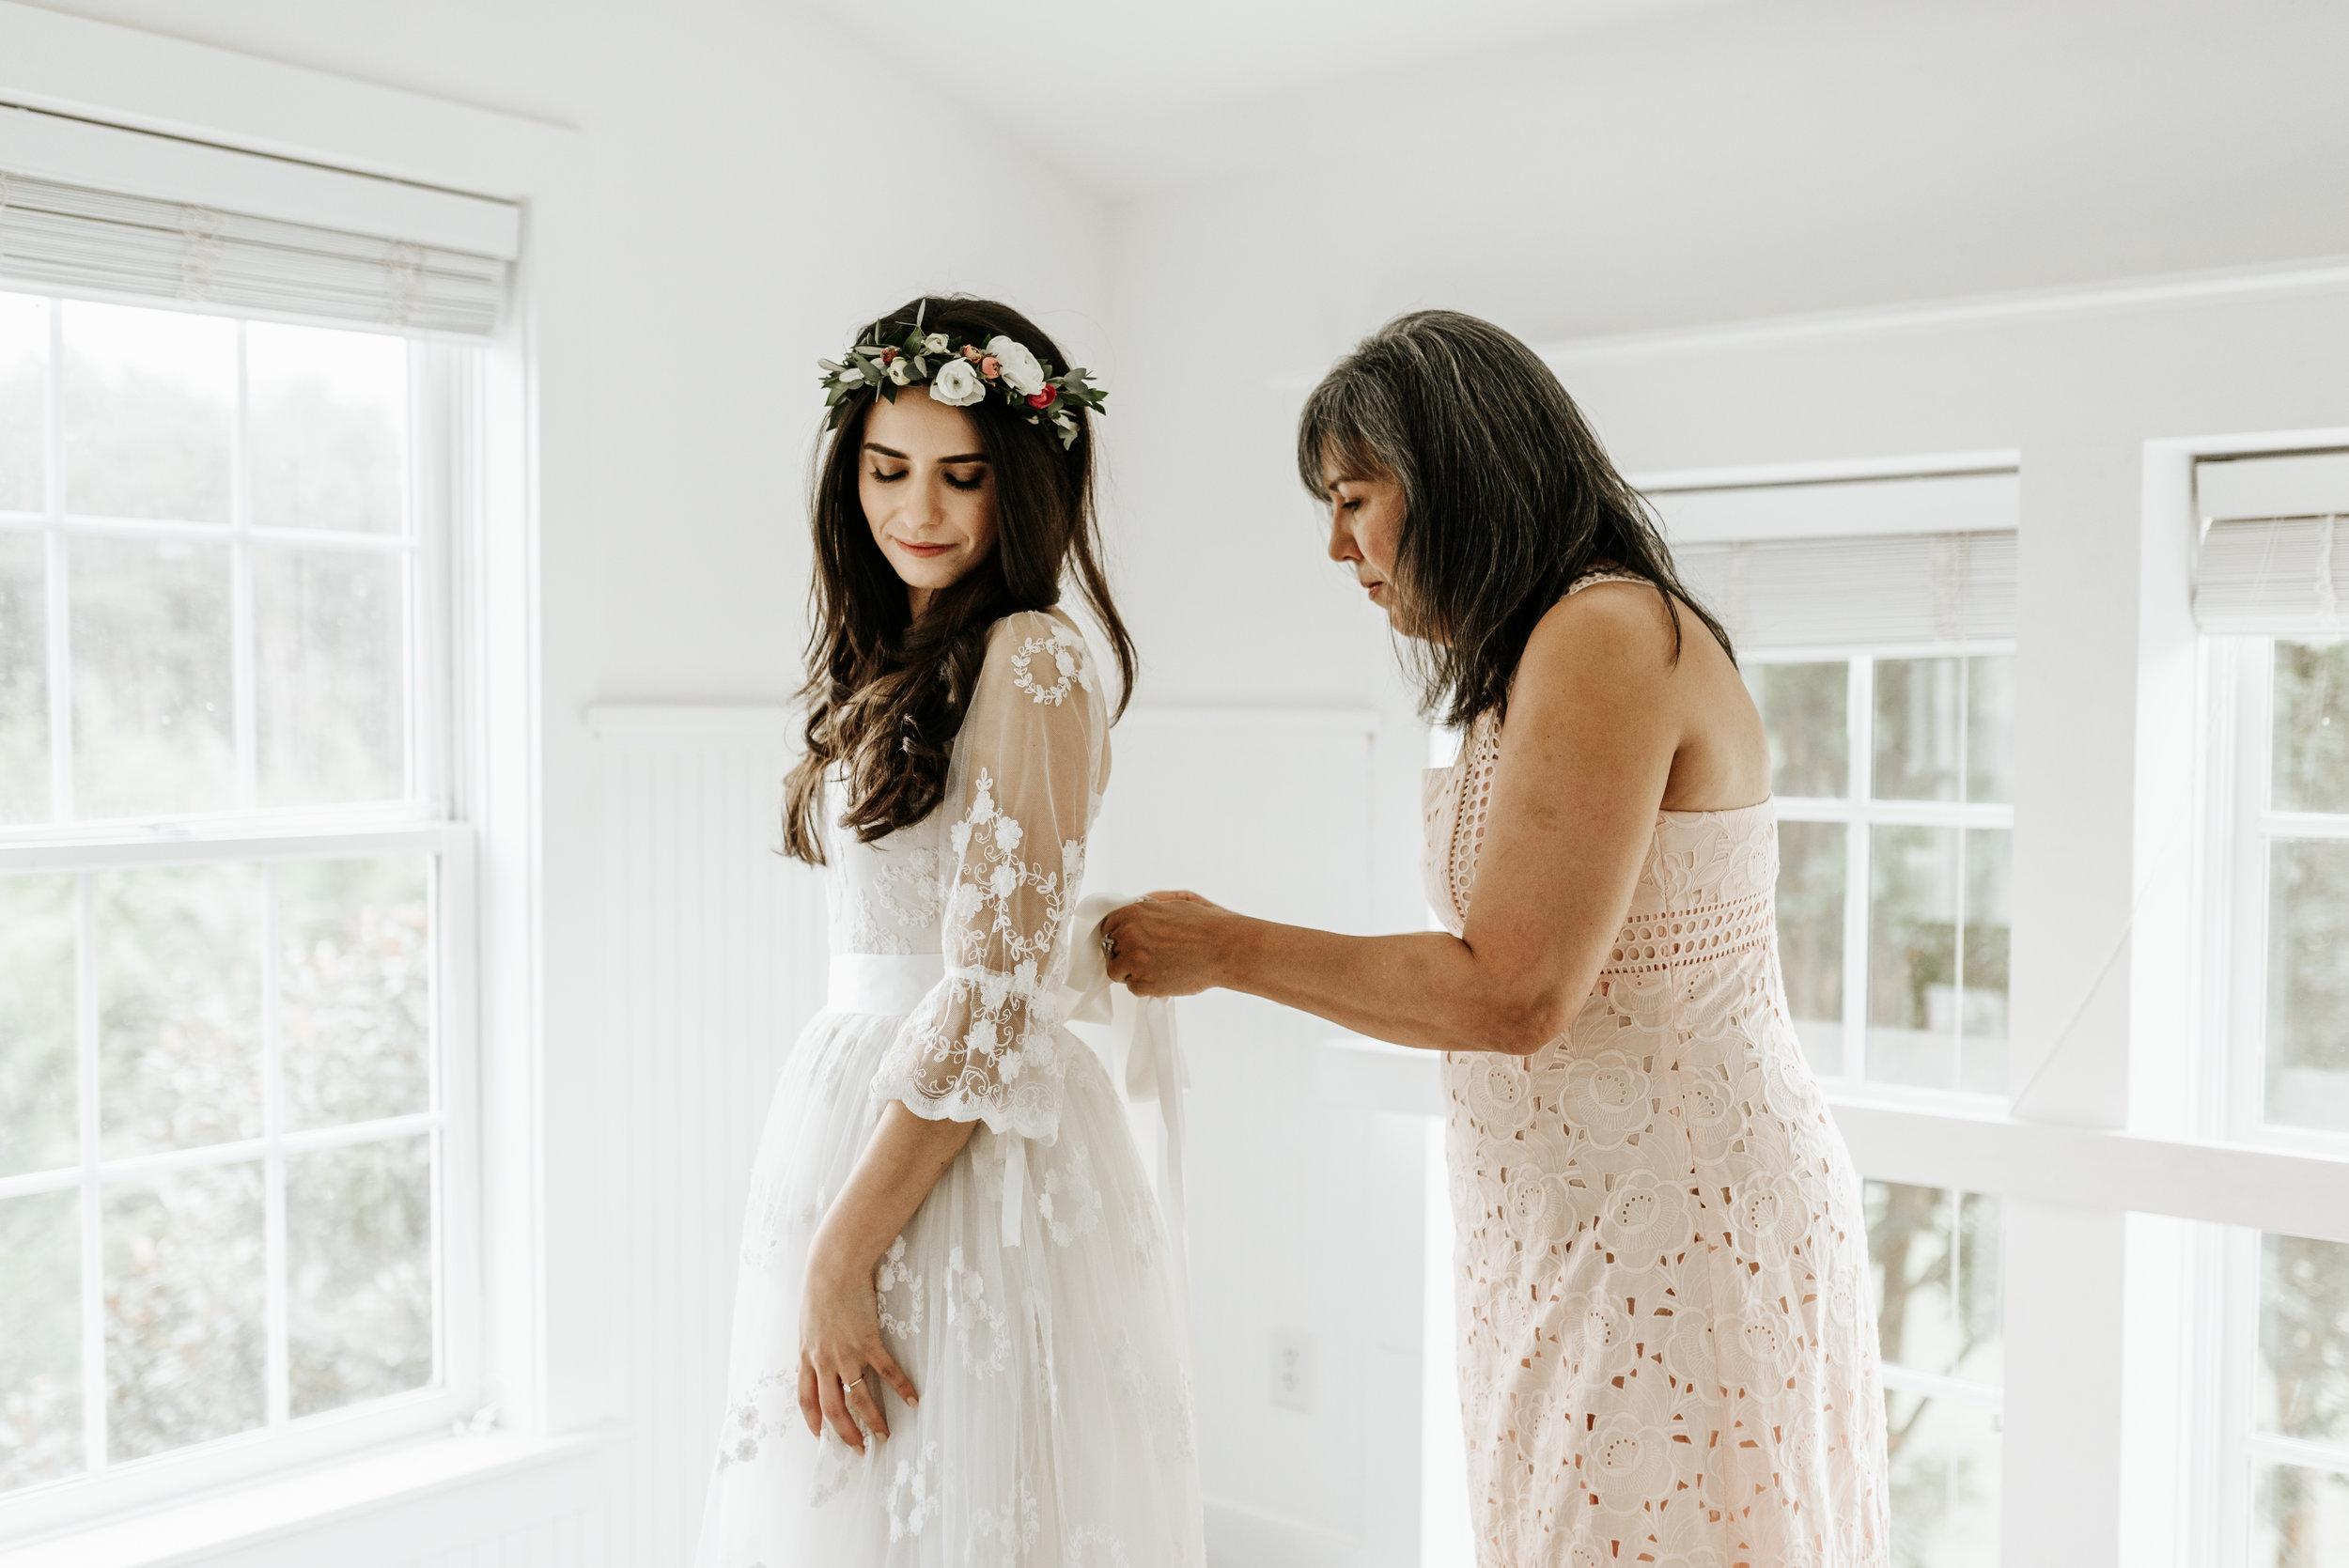 Veritas-Vineyards-and-Winery-Wedding-Photography-Afton-Virginia-Yasmin-Seth-Photography-by-V-9101.jpg